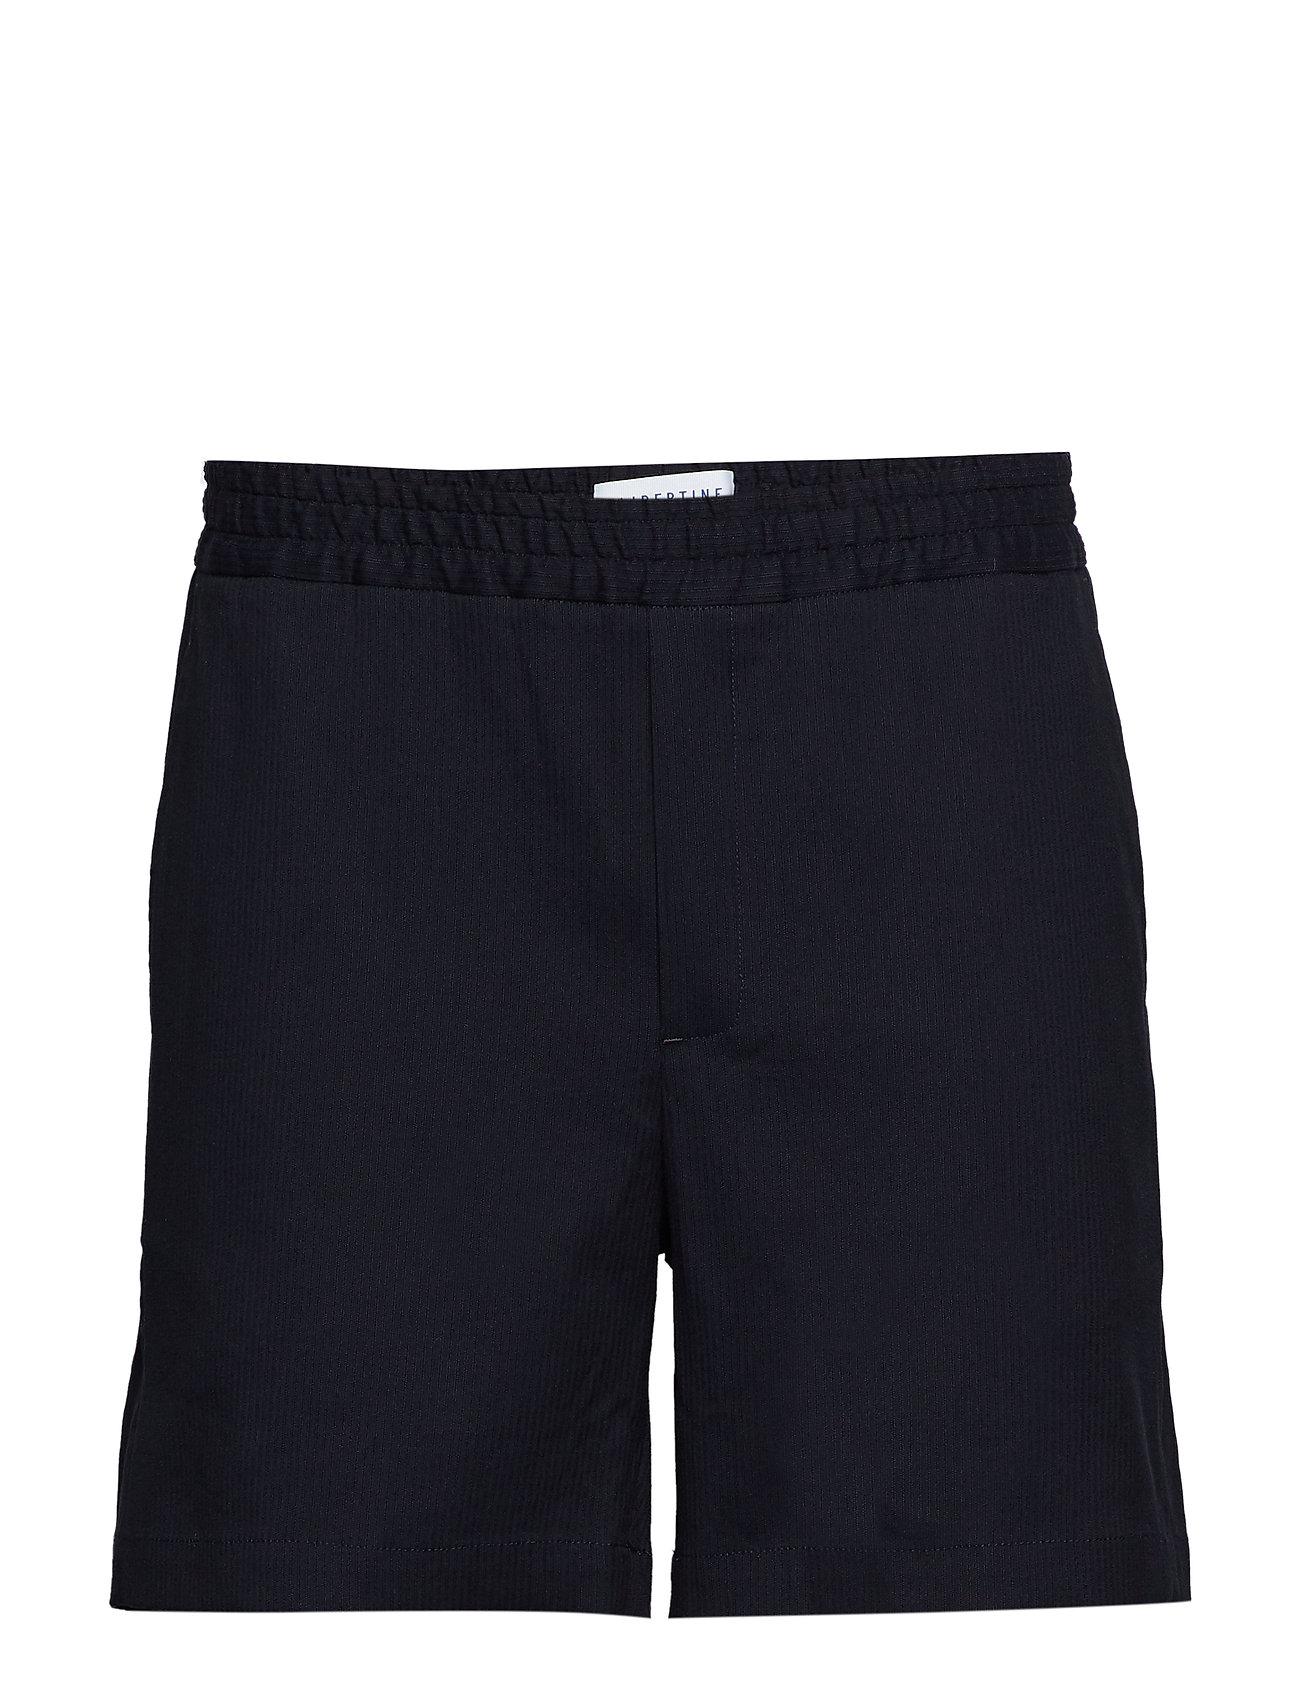 Libertine Libertine Front Shorts